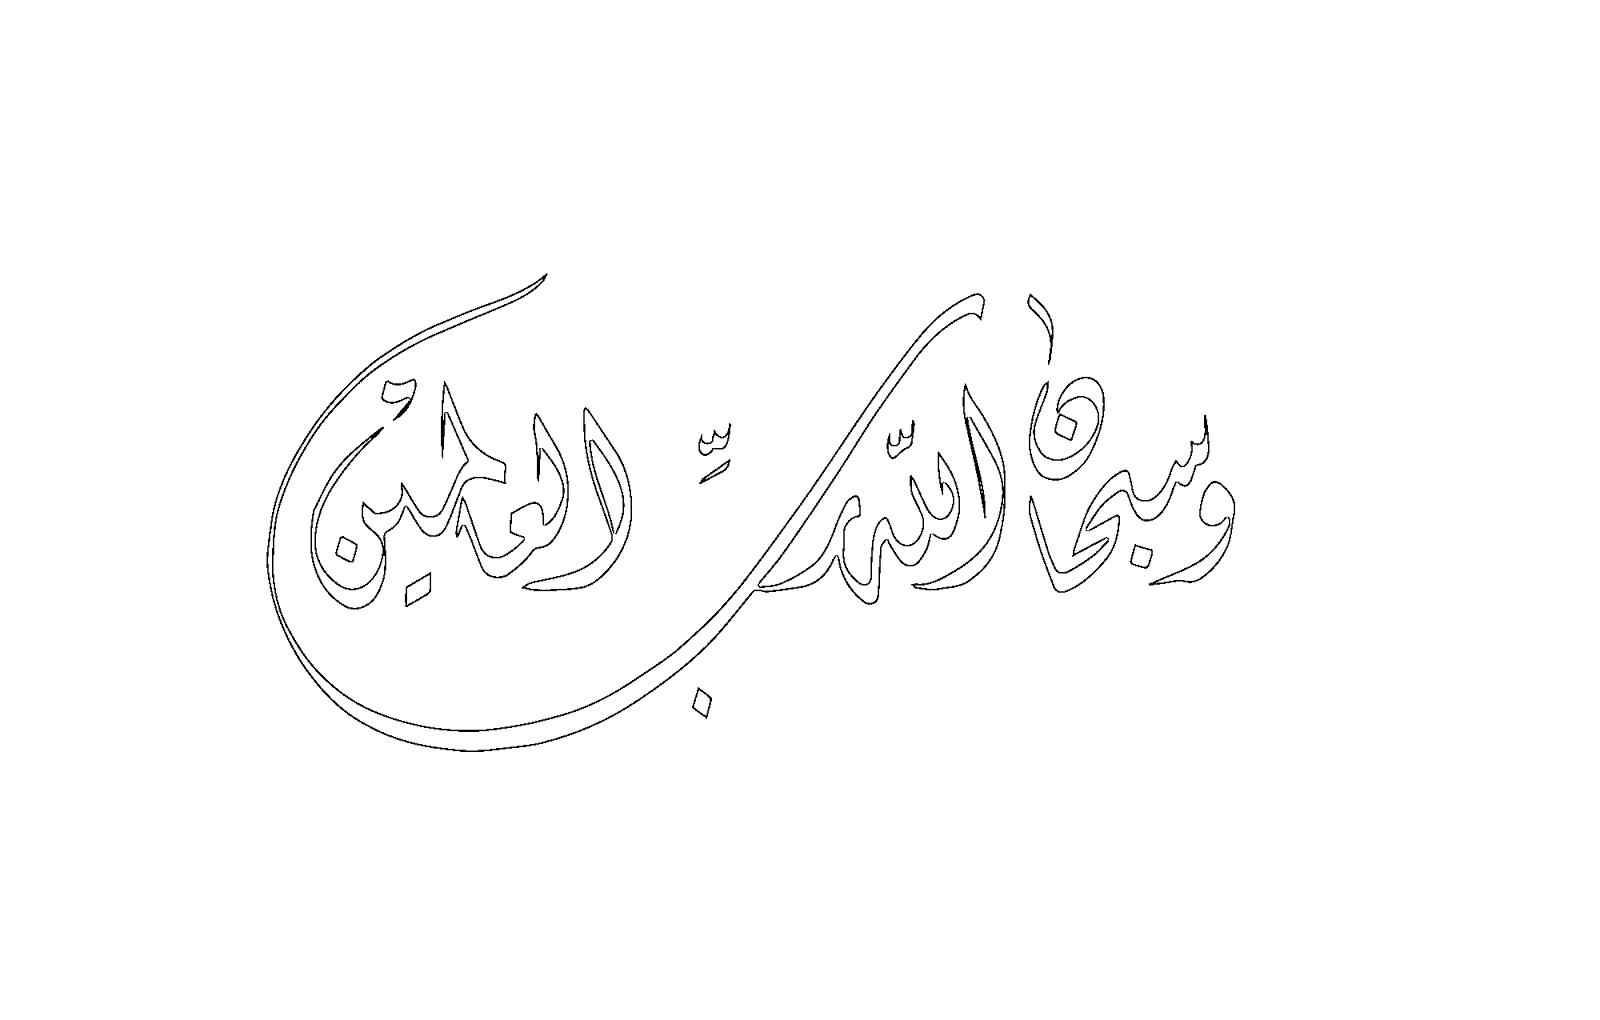 Dindersioyun Com Dini Yazi Boyama Allahin Sifatlari 8